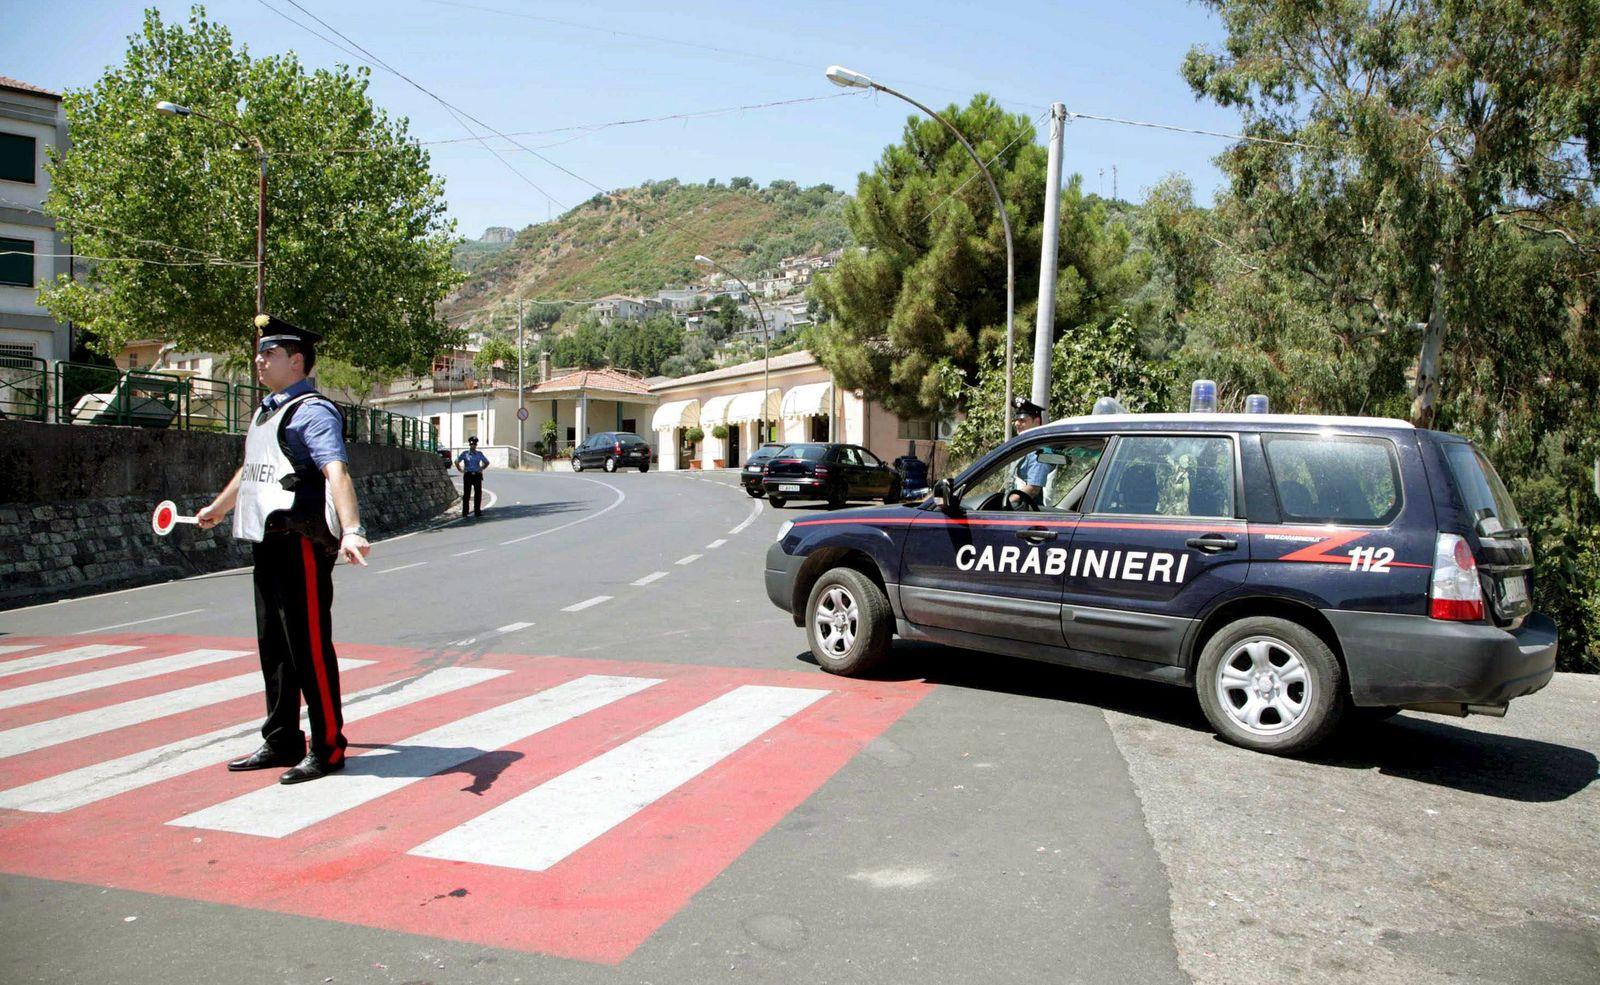 Nach Sechsfachmord in Duisburg - Polizei in San Luca